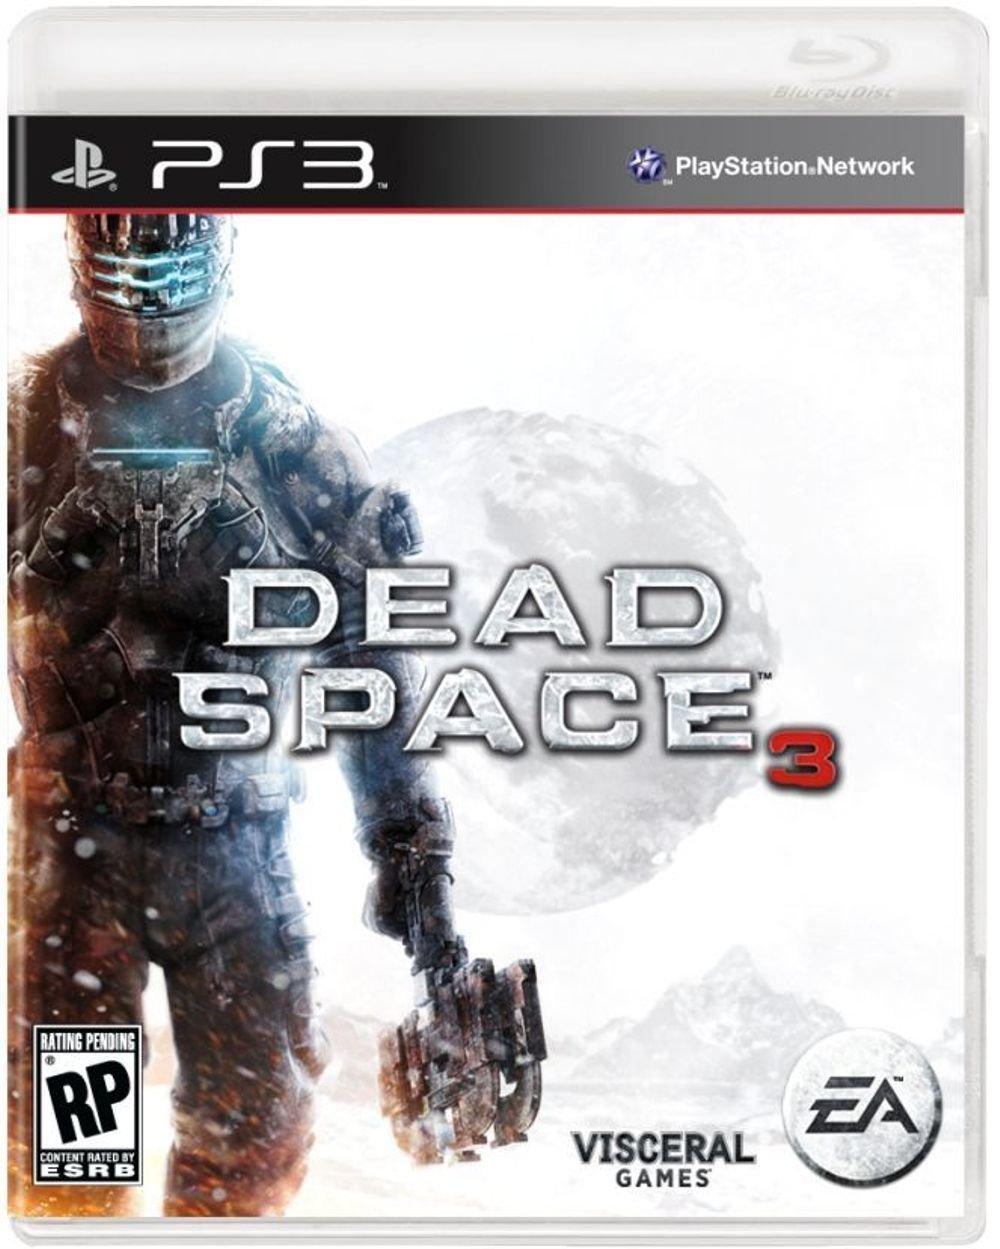 Amazon: Dead Space 3 PS3 - $193